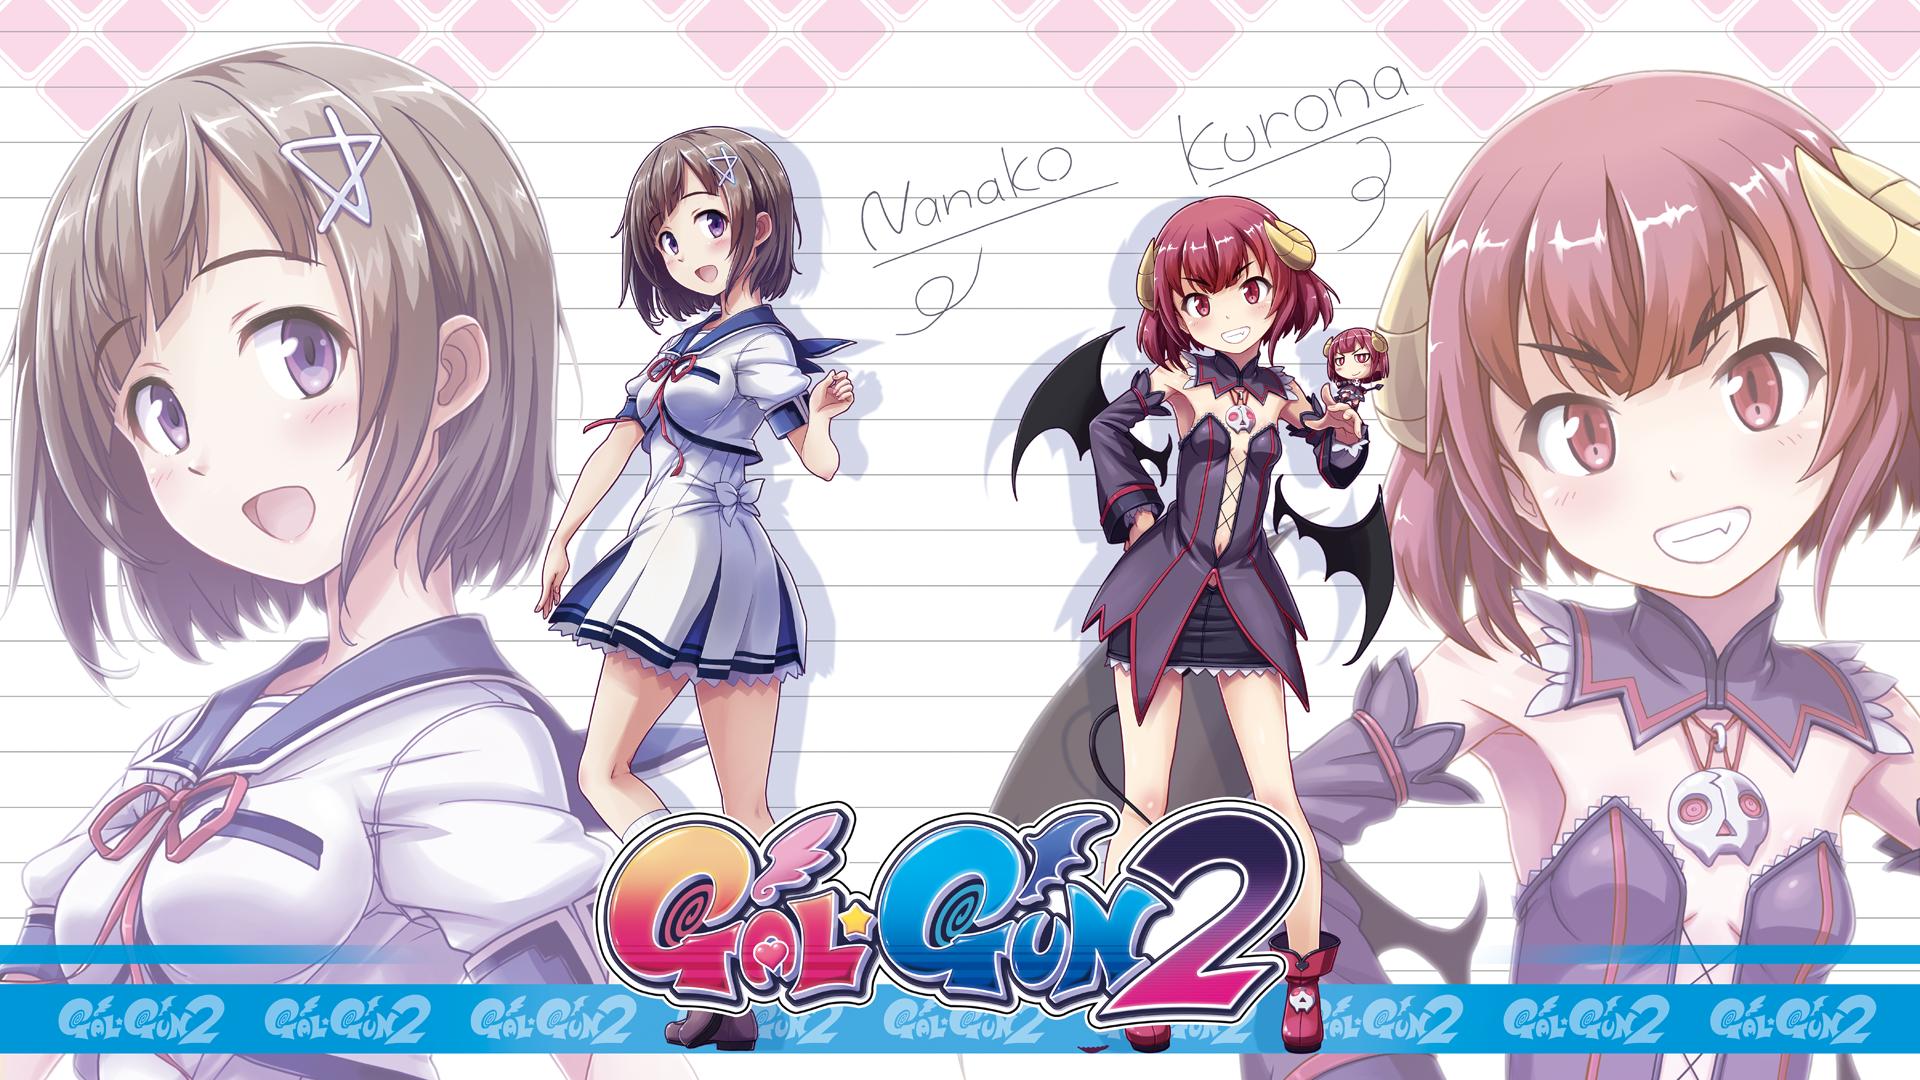 Gal*Gun 2 - Nanako and Kurona